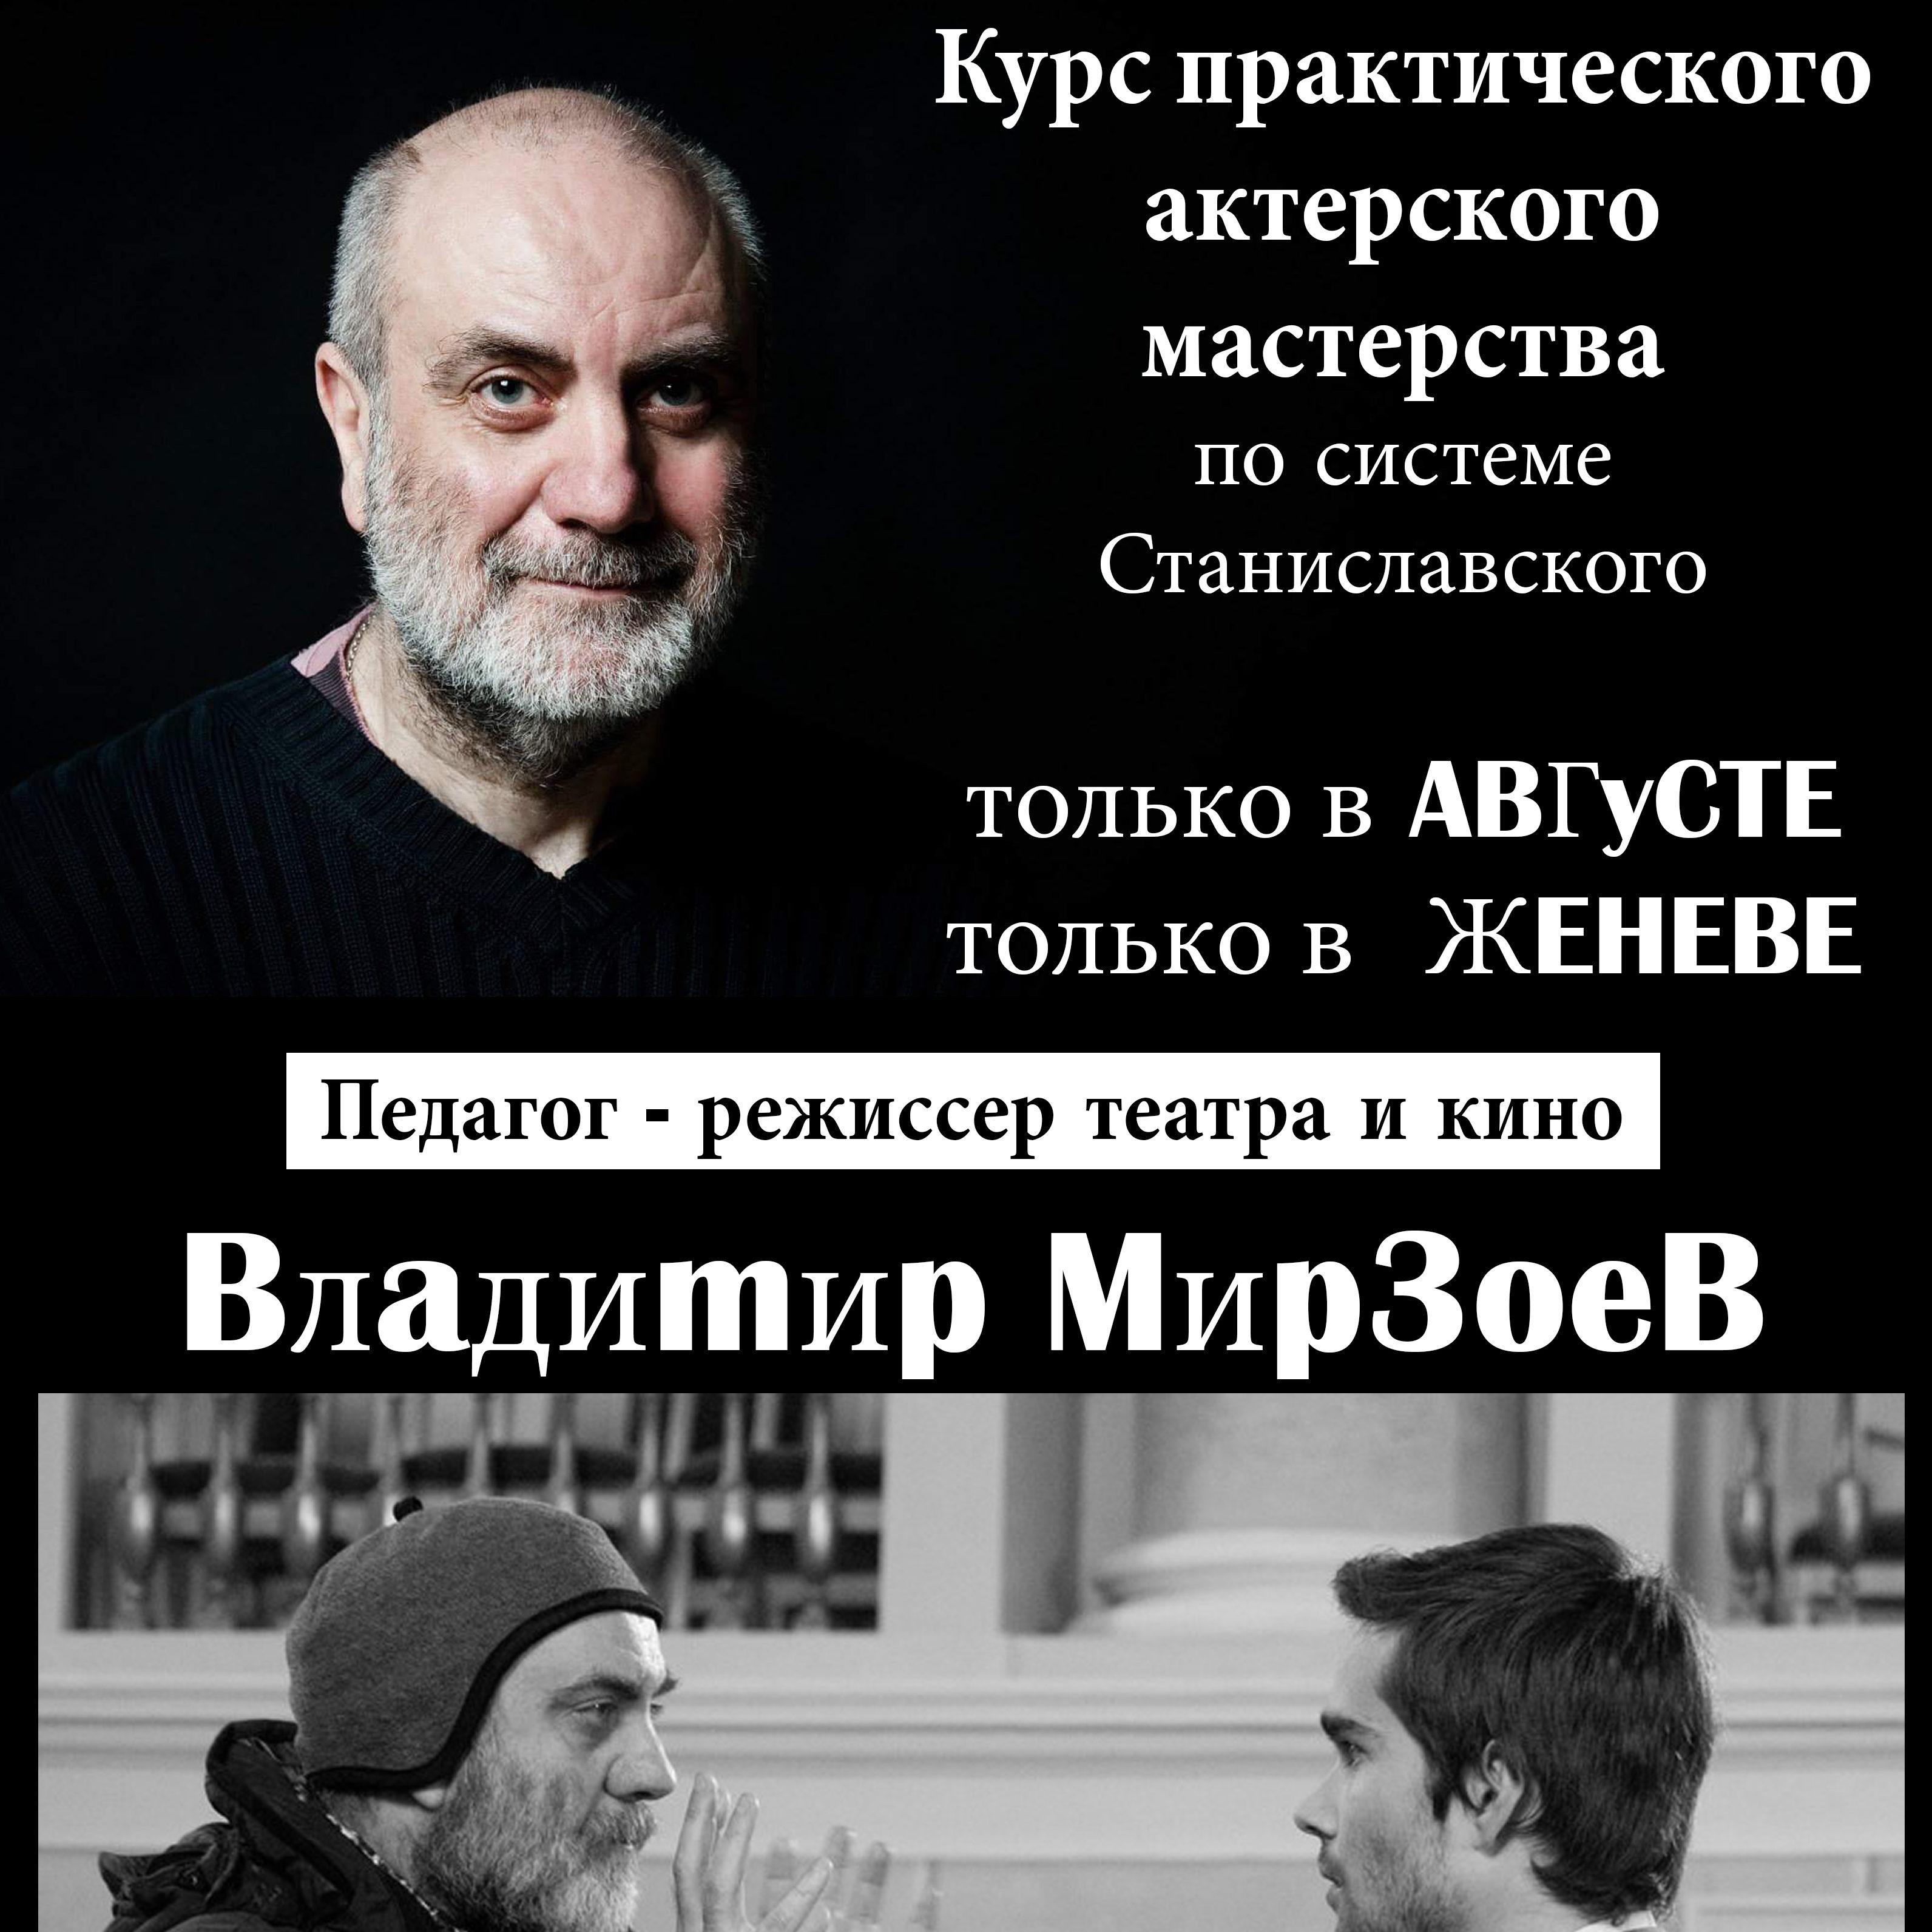 Мастер-класс Владимира Мирзоева